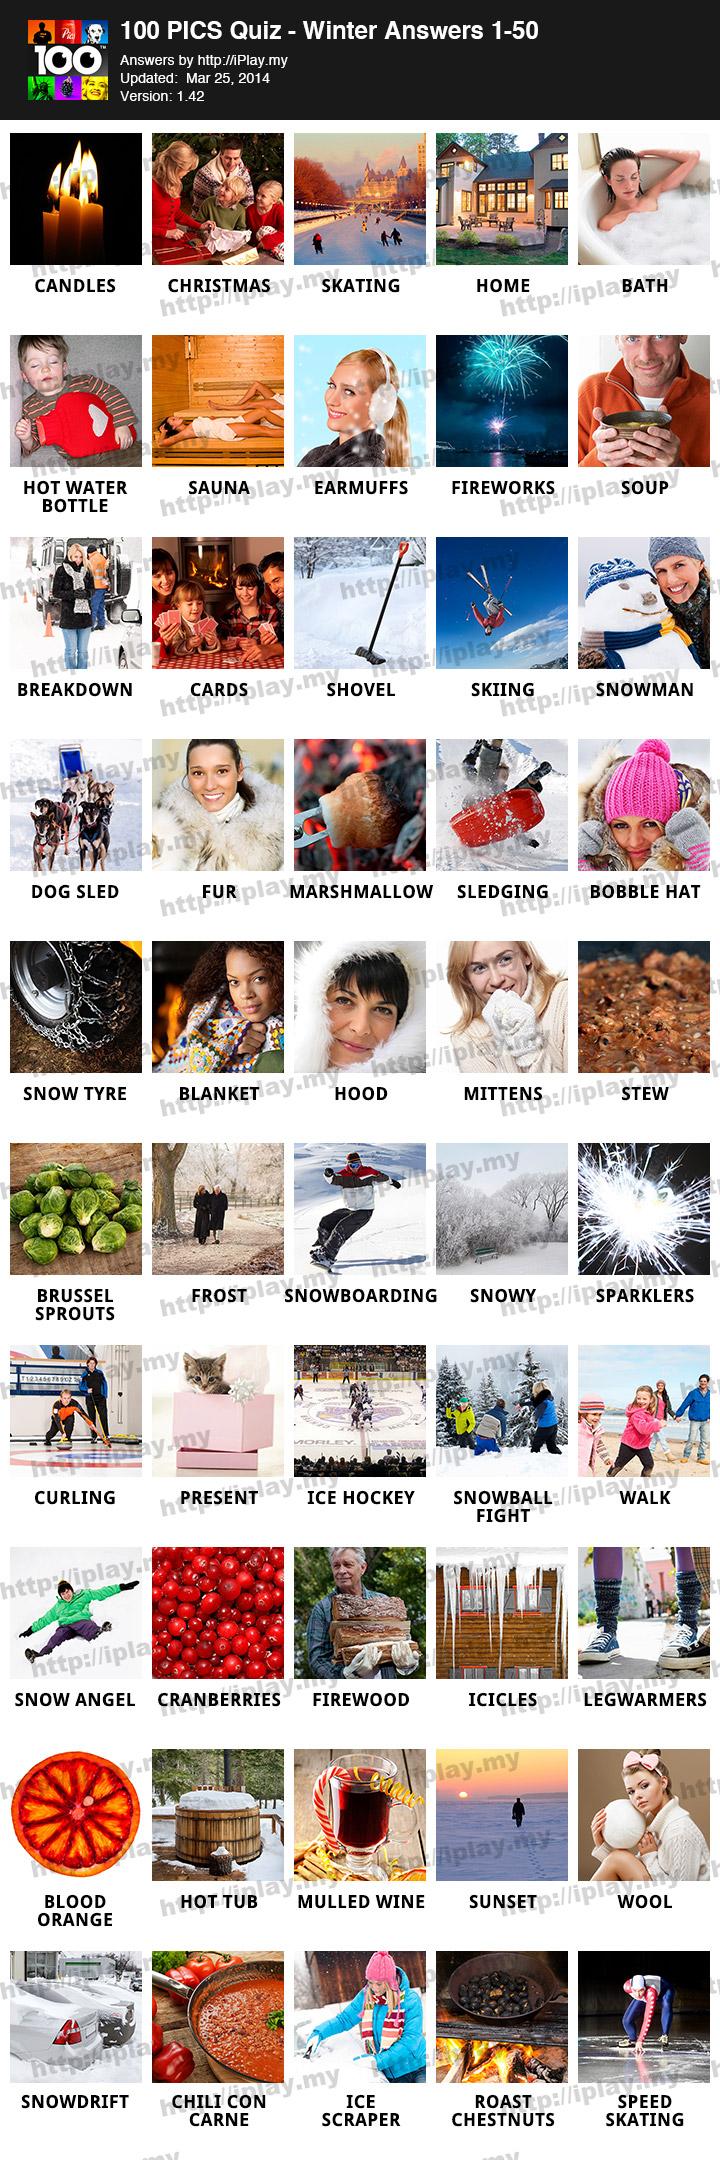 100 PICS Quiz – Winter Pack Answers | iPlay.my